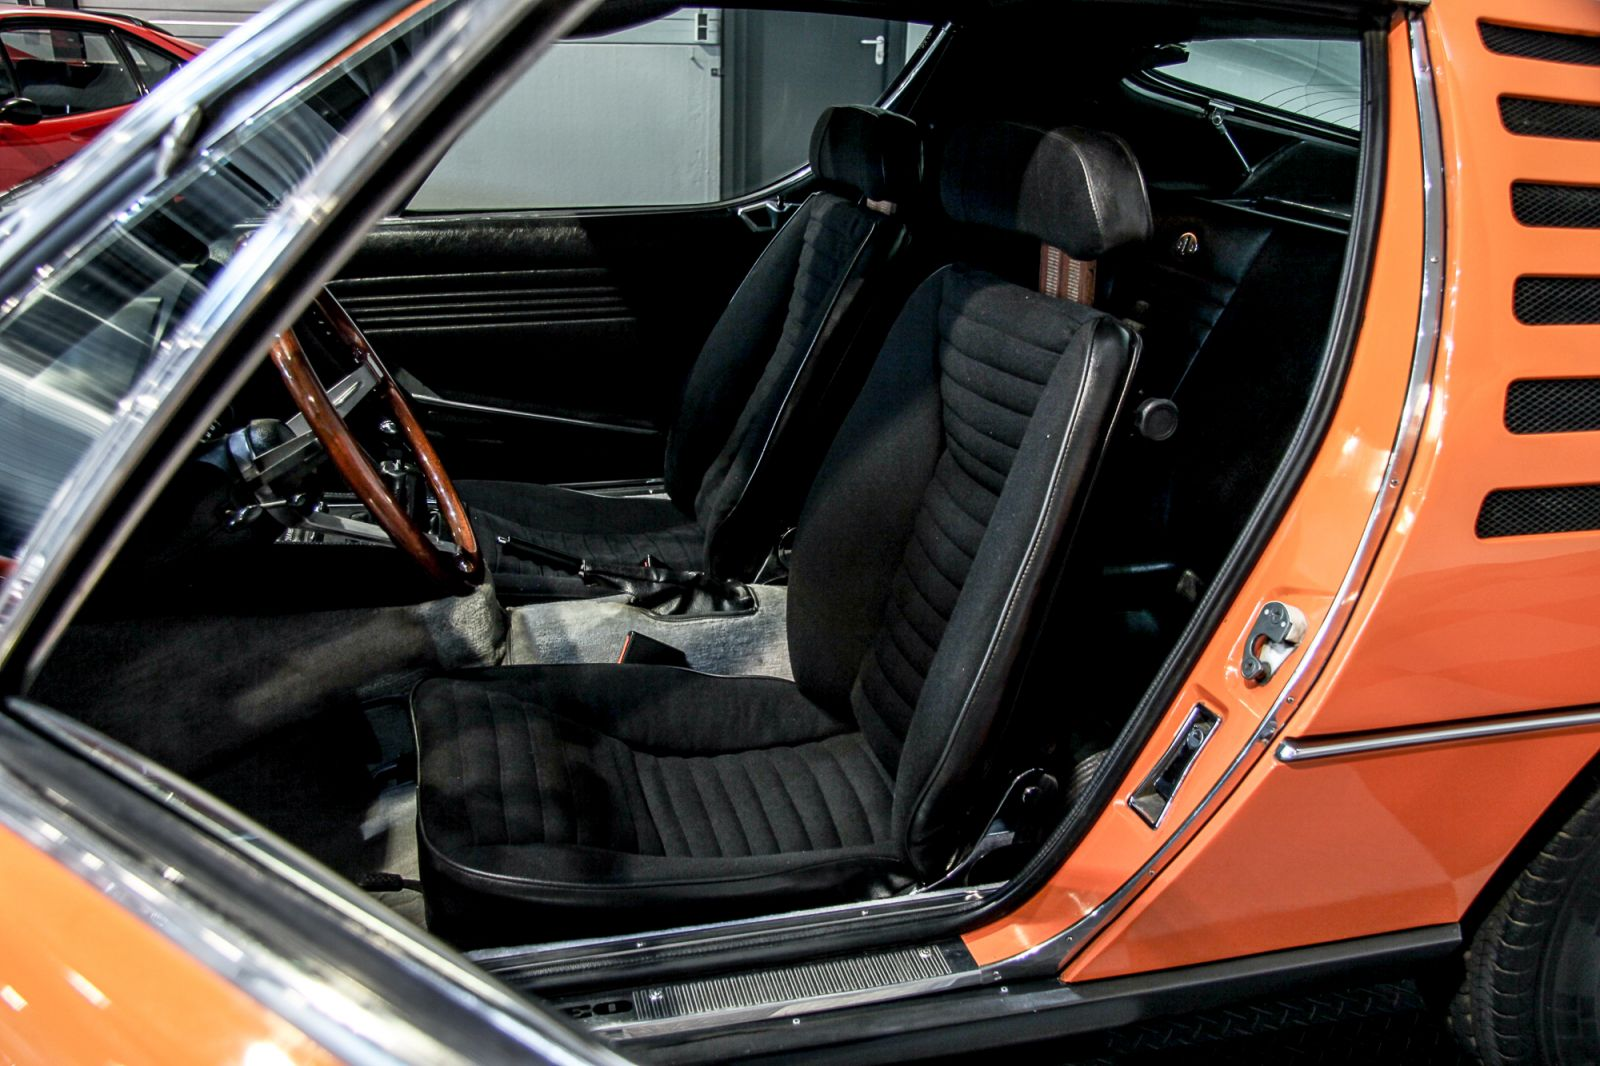 Dream garage sold carsalfa romeo alfa romeo montreal for Garage auto 93